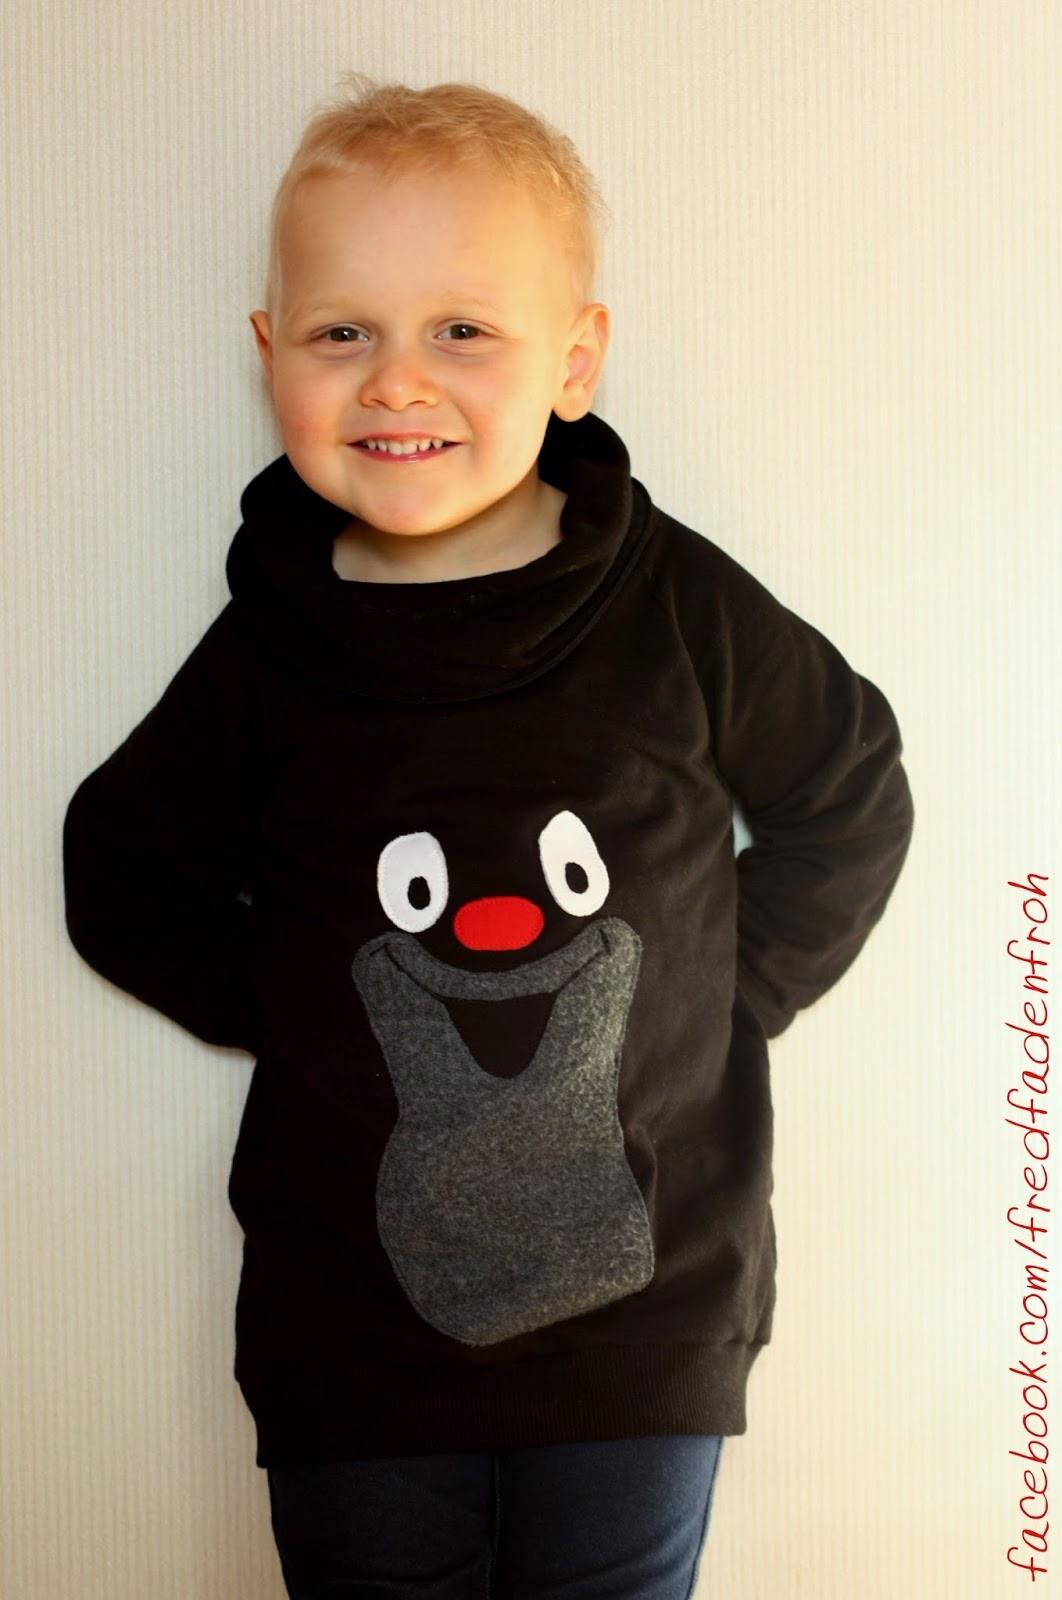 Maulwurf, kleiner Maulwurf, Applikation, Longsweater Boys, mommymade